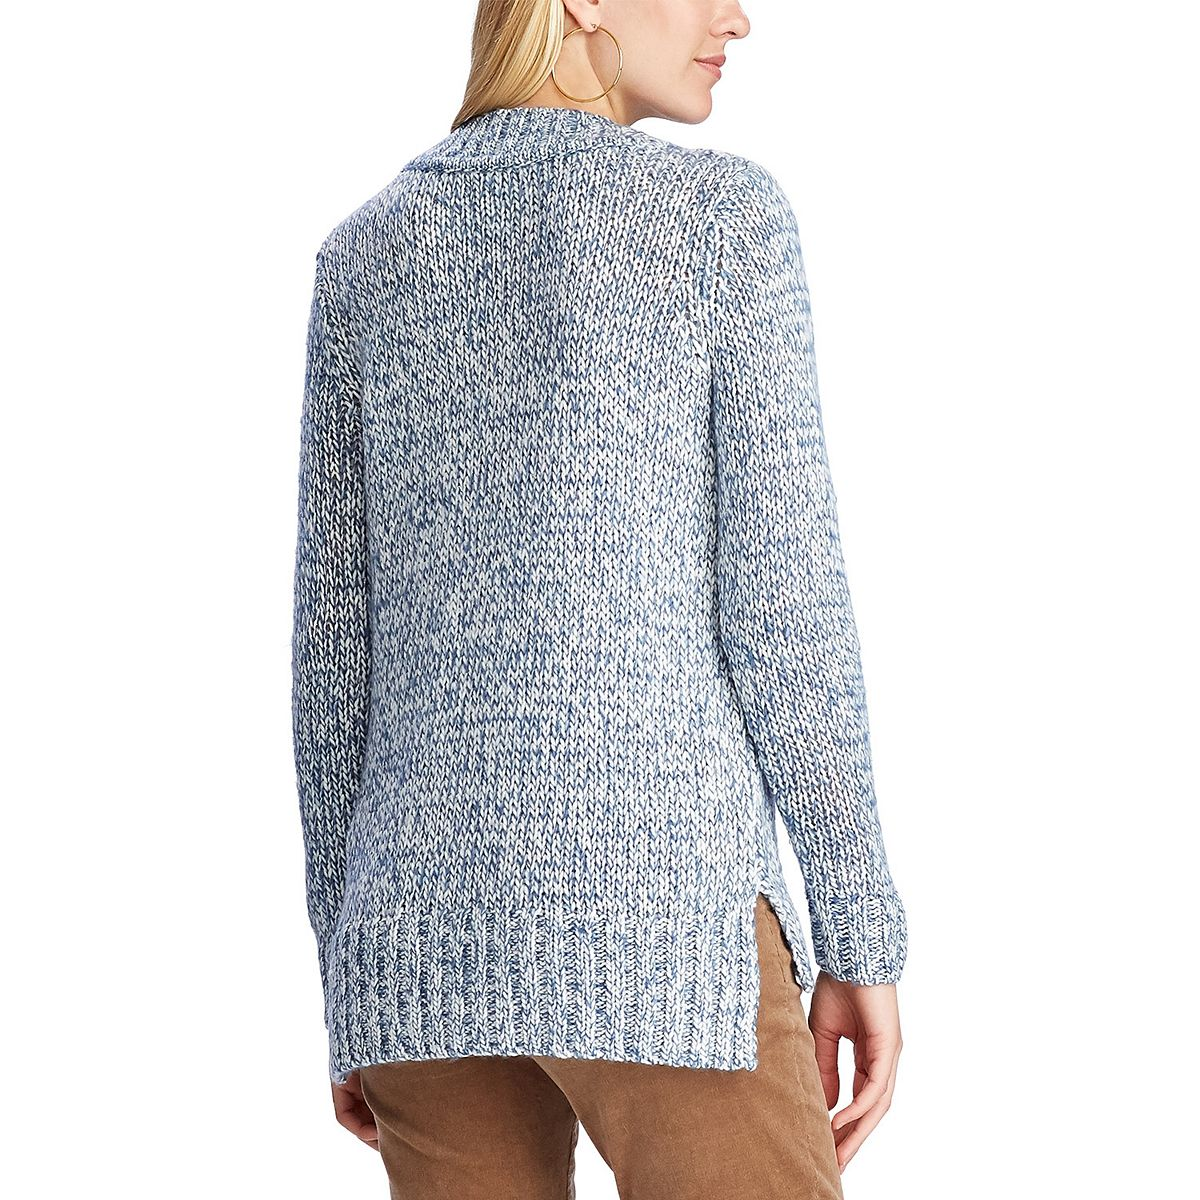 Women's Chaps Sparkle Long Sleeve Sweater Cream Sparkle CLBBu